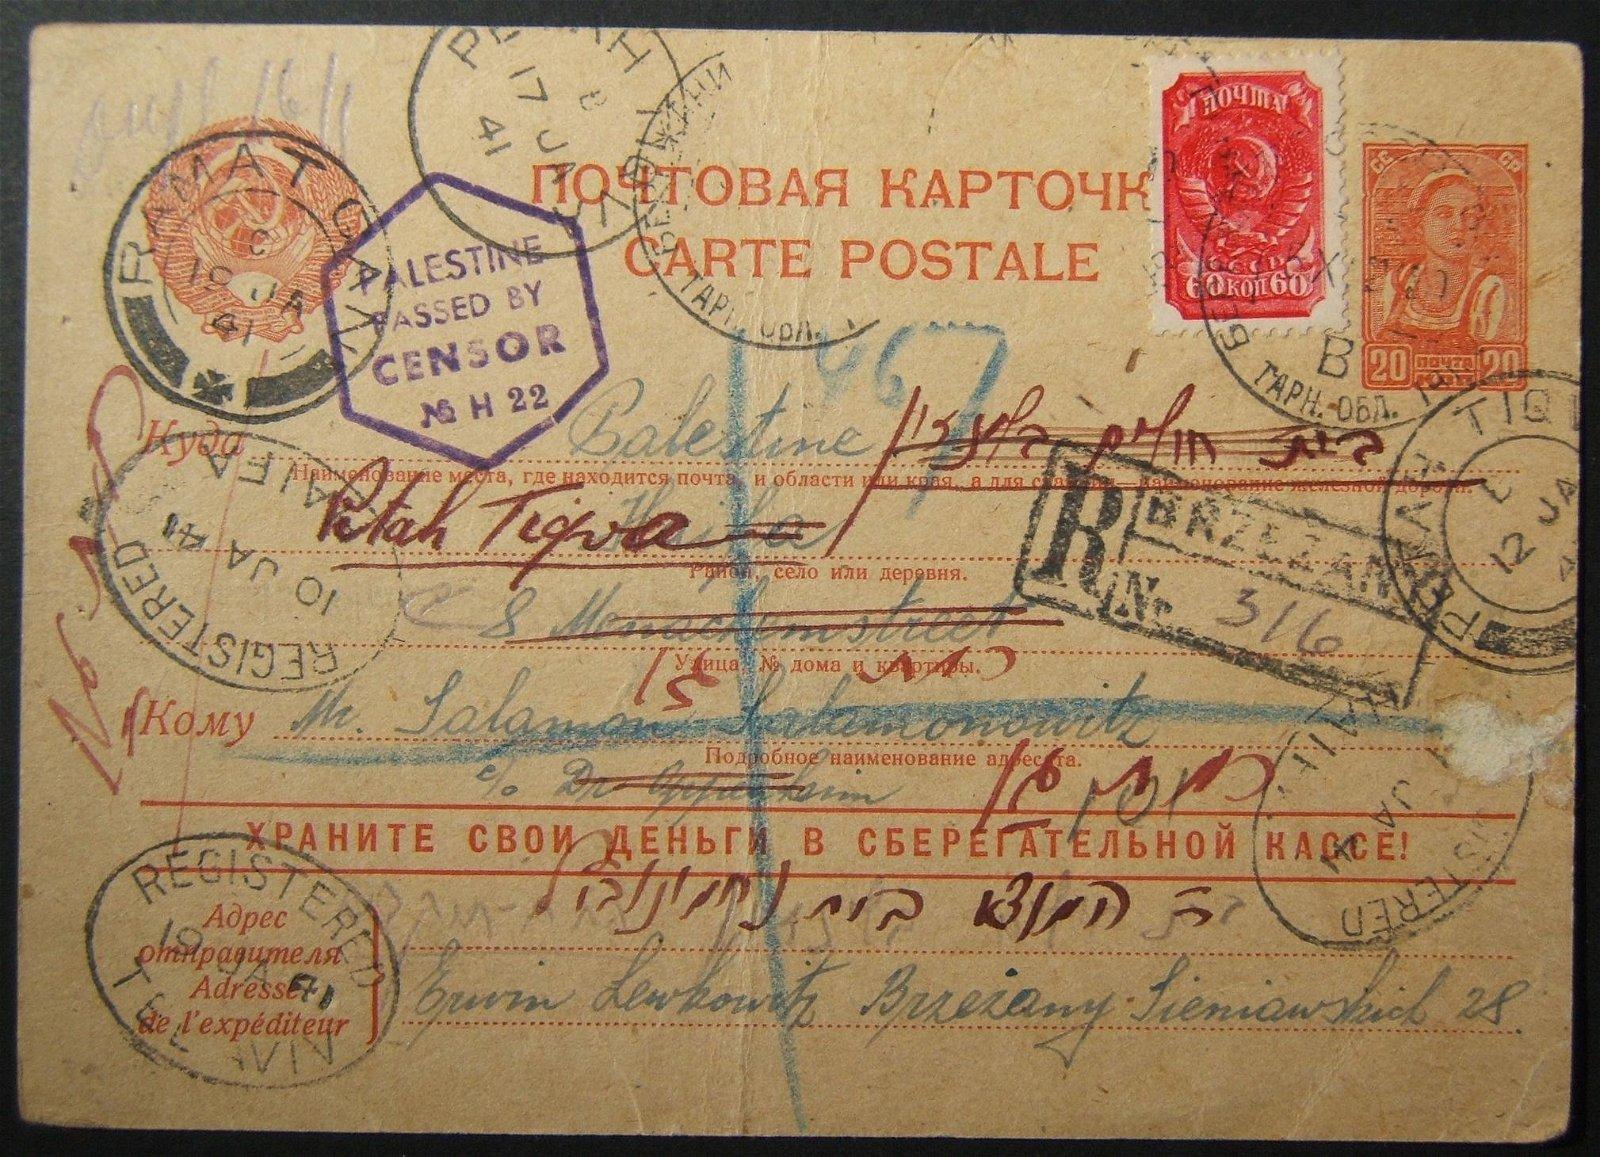 11/1940 WWII Jewish cv, Soviet-occupied BEREZHANY to